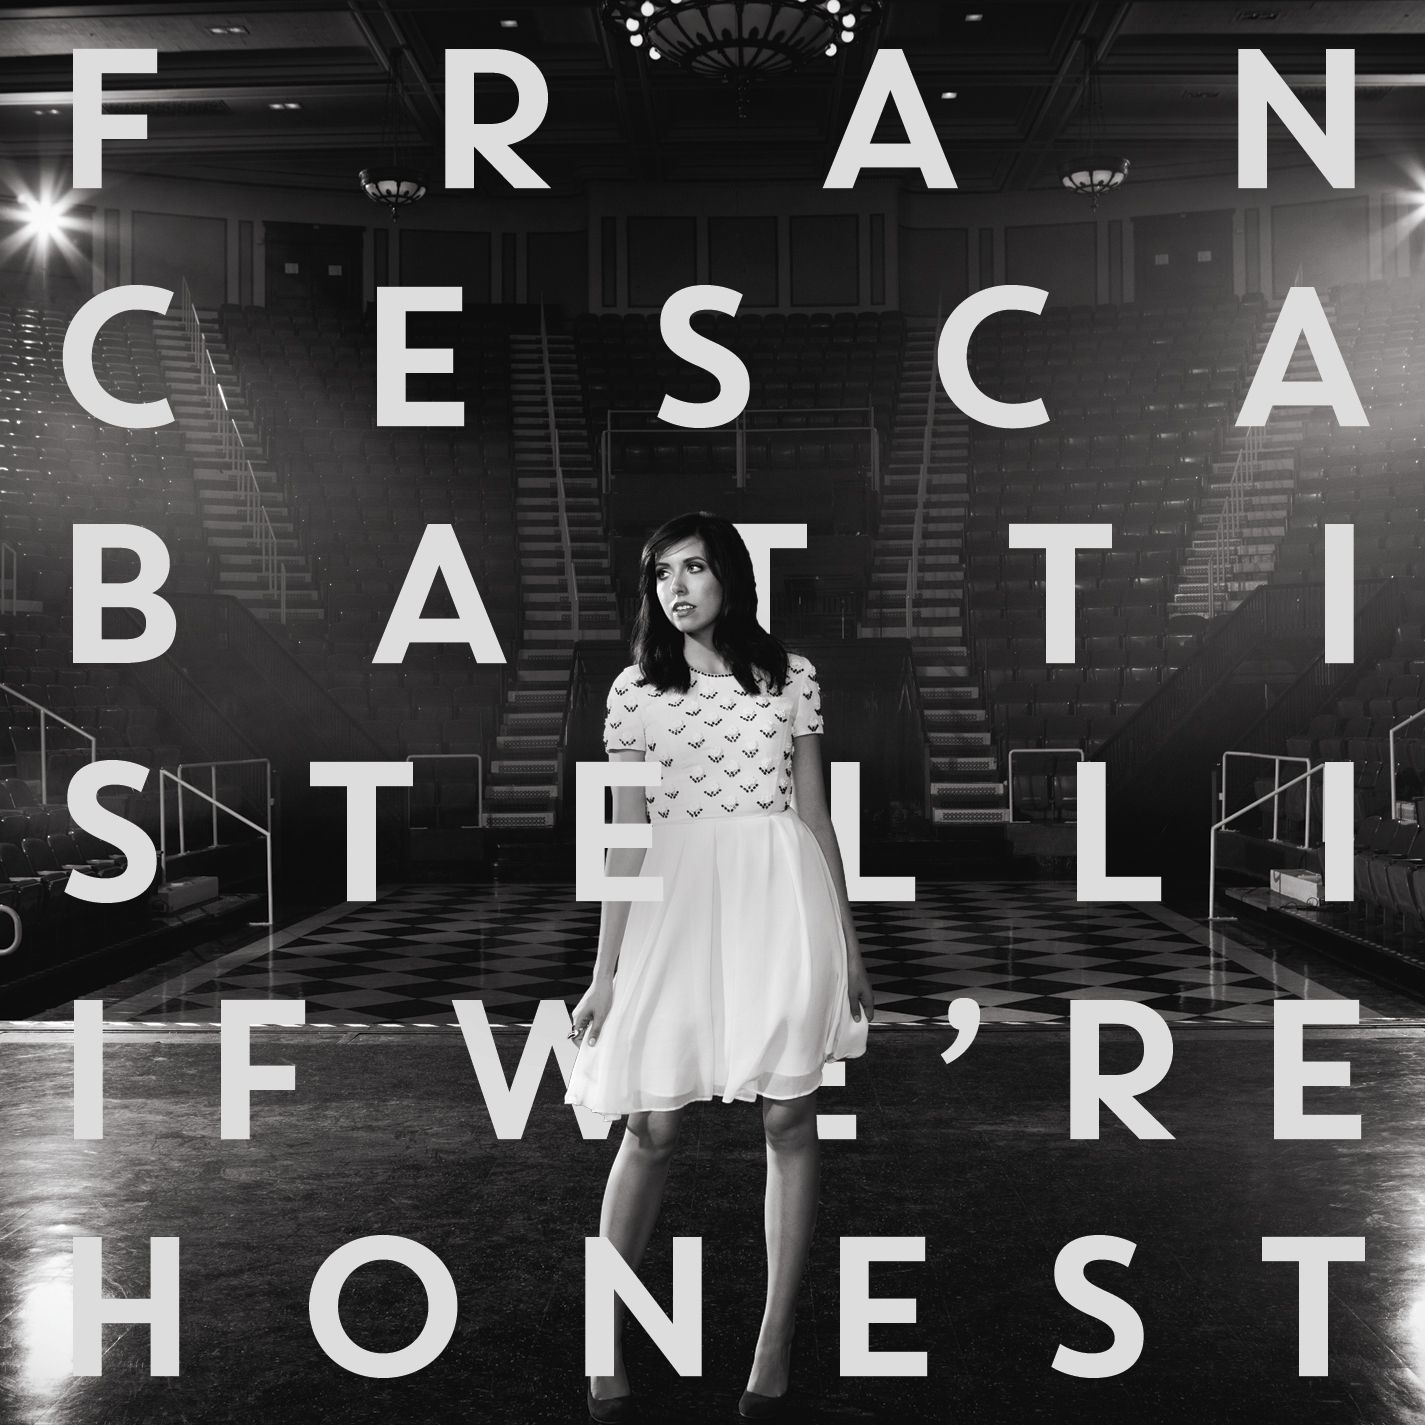 Francesca Battistelli-If We're Honest